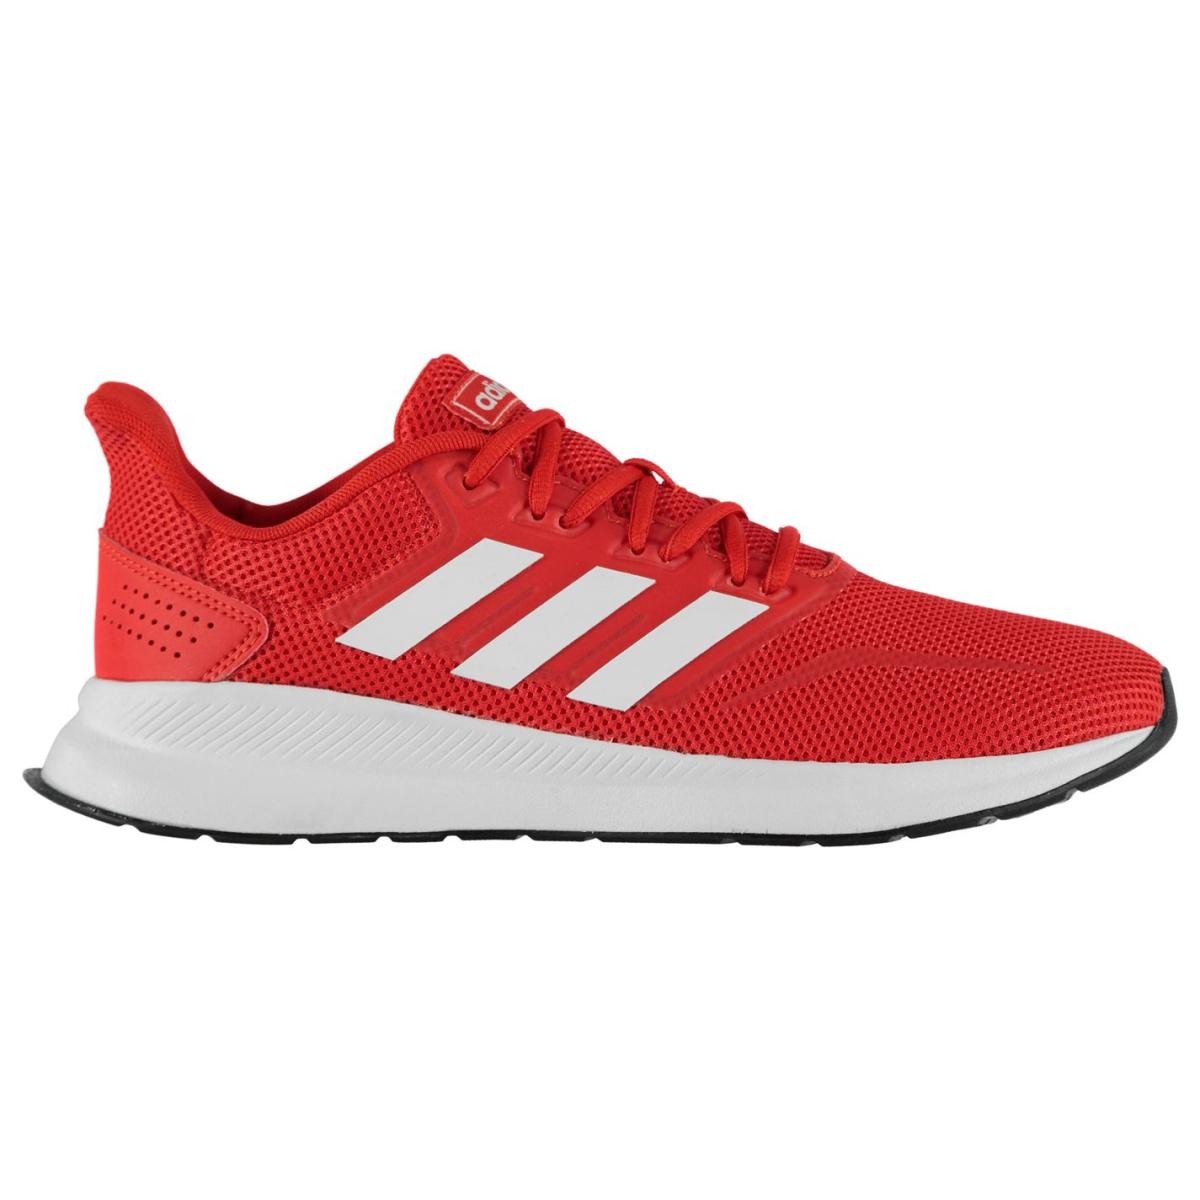 adidas Herren Turnschuhe Falcon Rot_Weiß